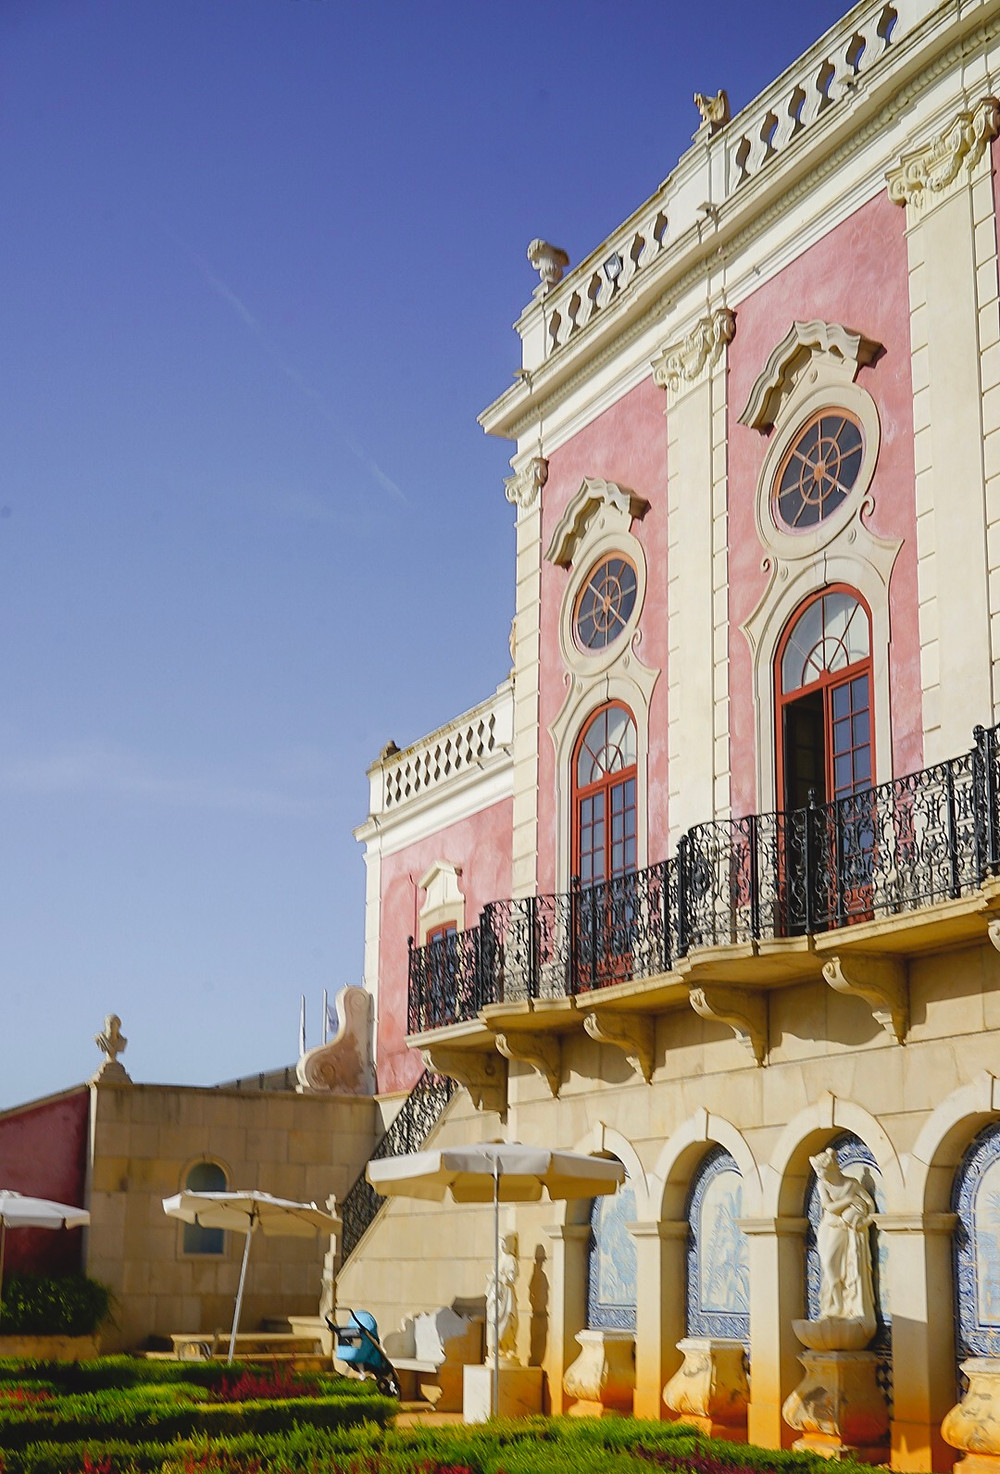 Pousada de Estoi - Palacio de Estoi, Faro Algarve Portugal Wedding Venue